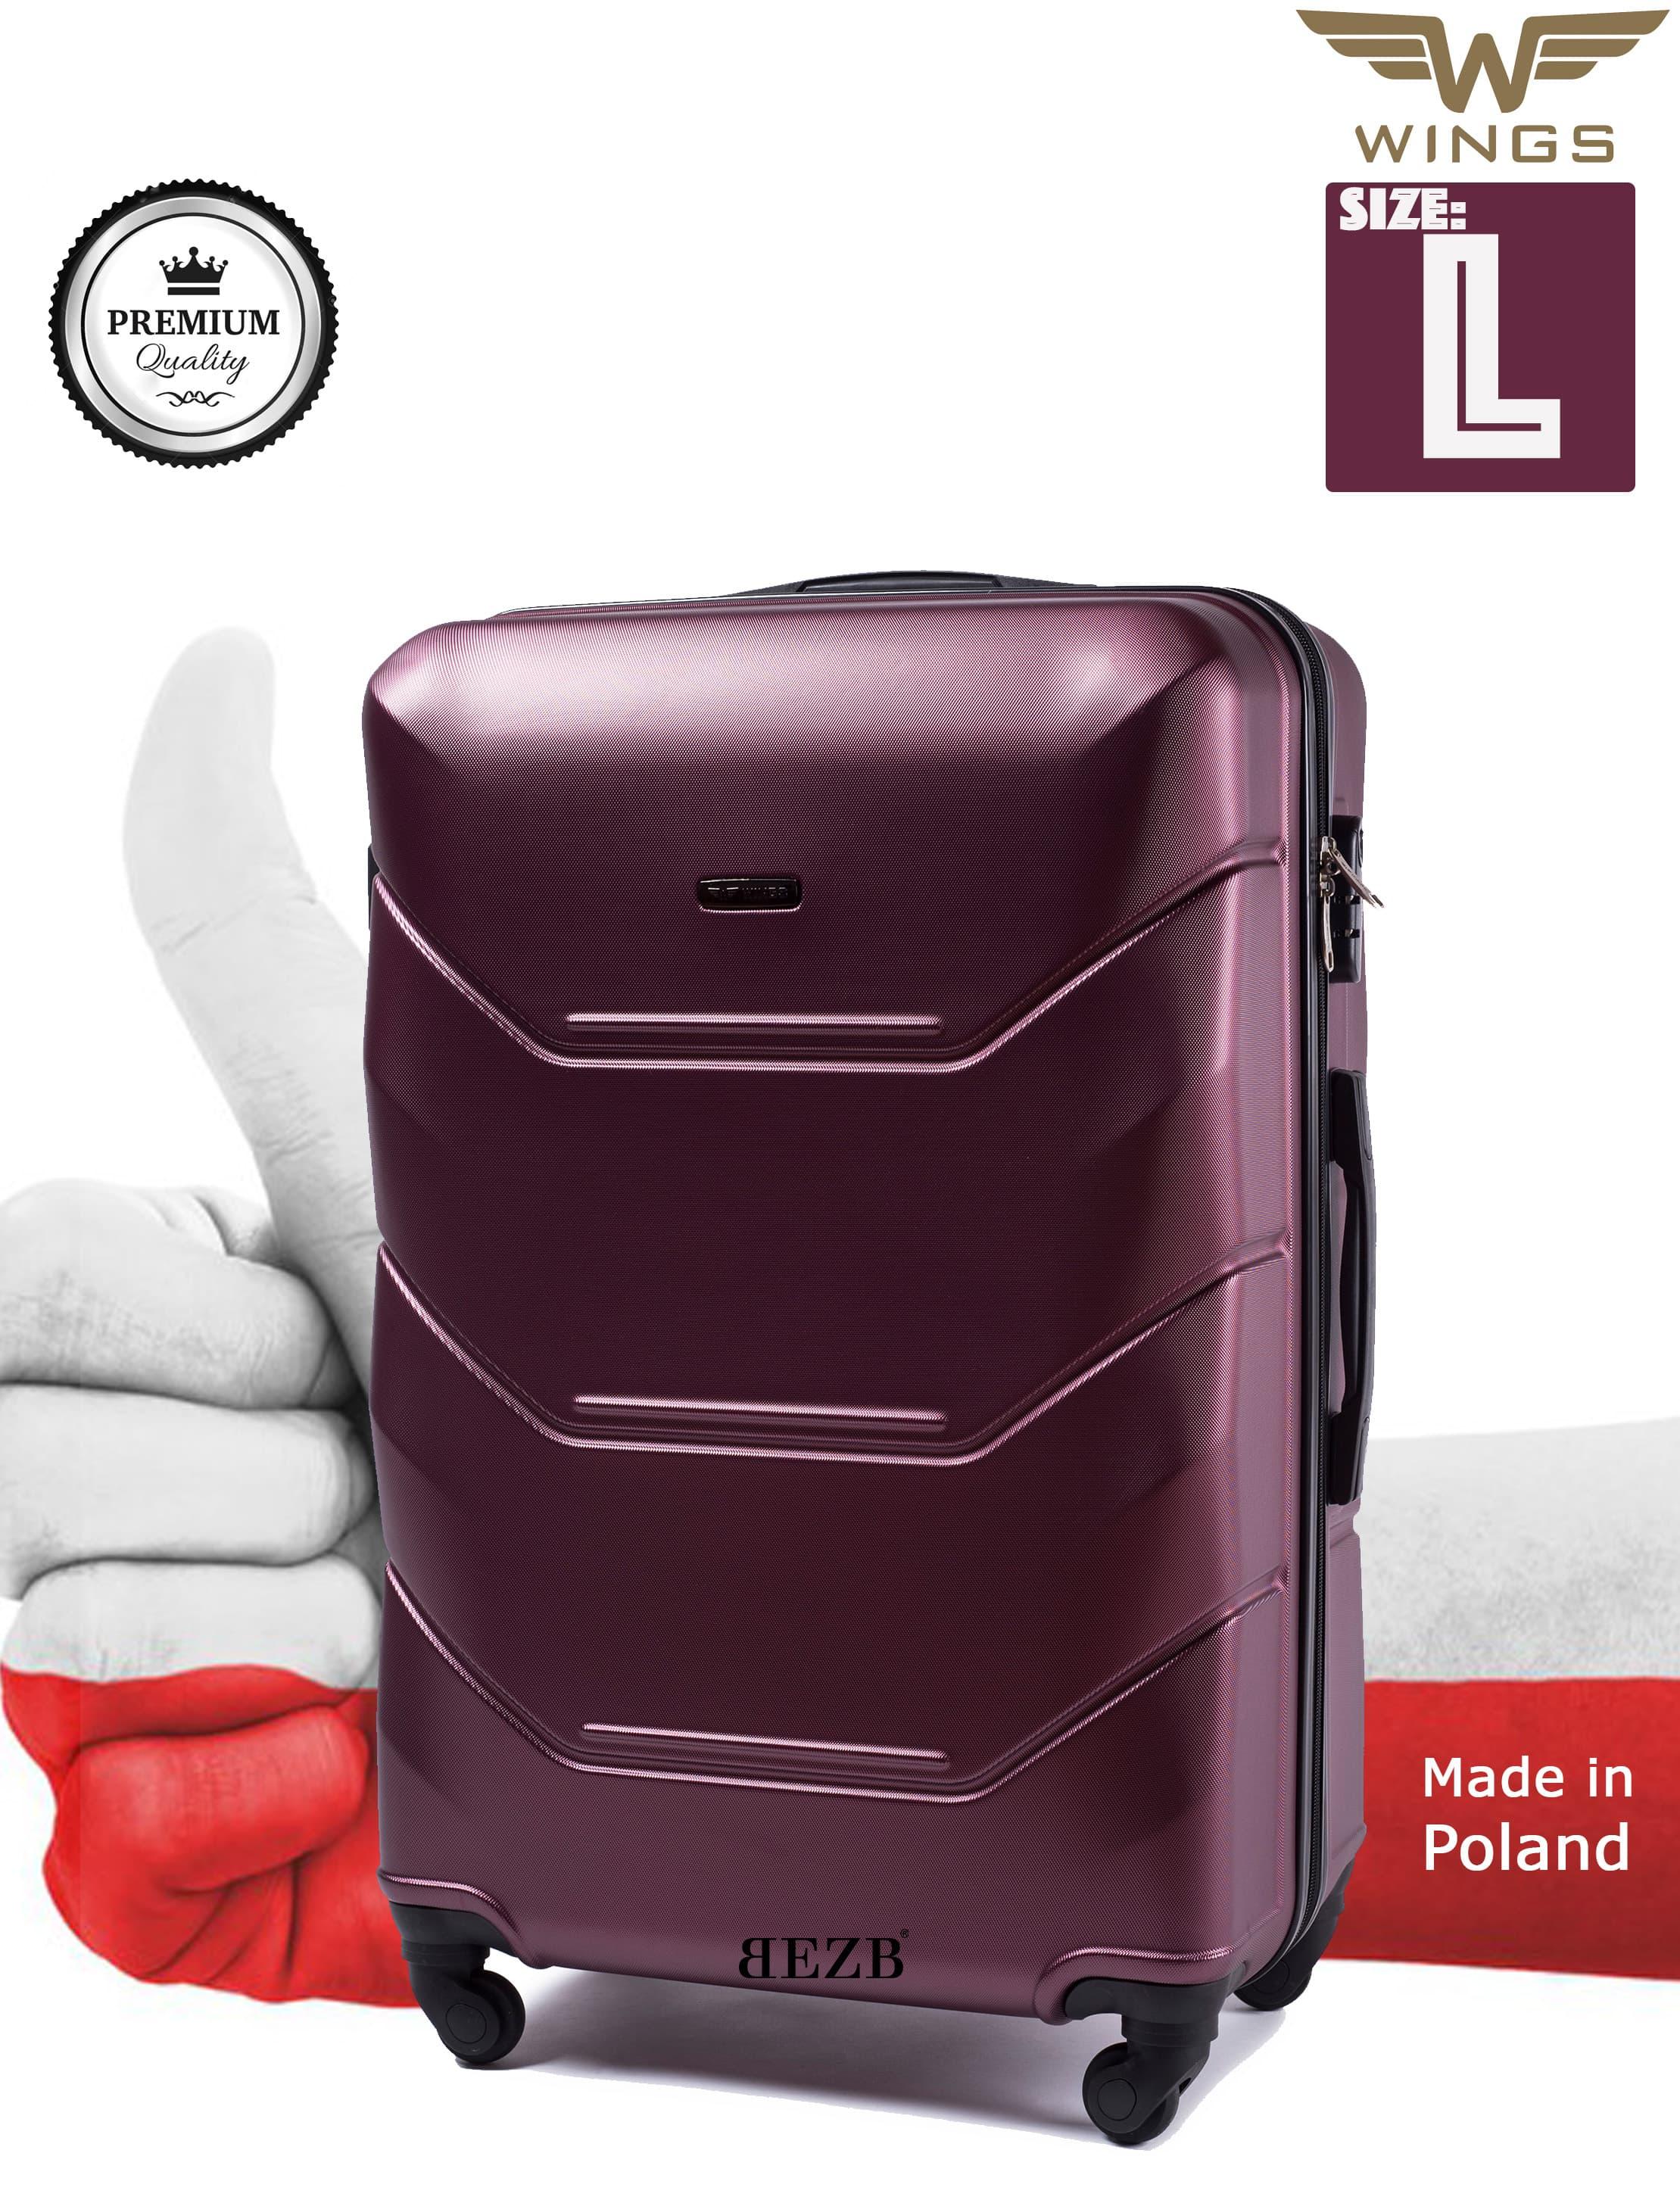 Valiza mare WINGS 147 L BURGUD Premium pe 4 roti din cauciuc!Pt bagaj,pina la 23 kg